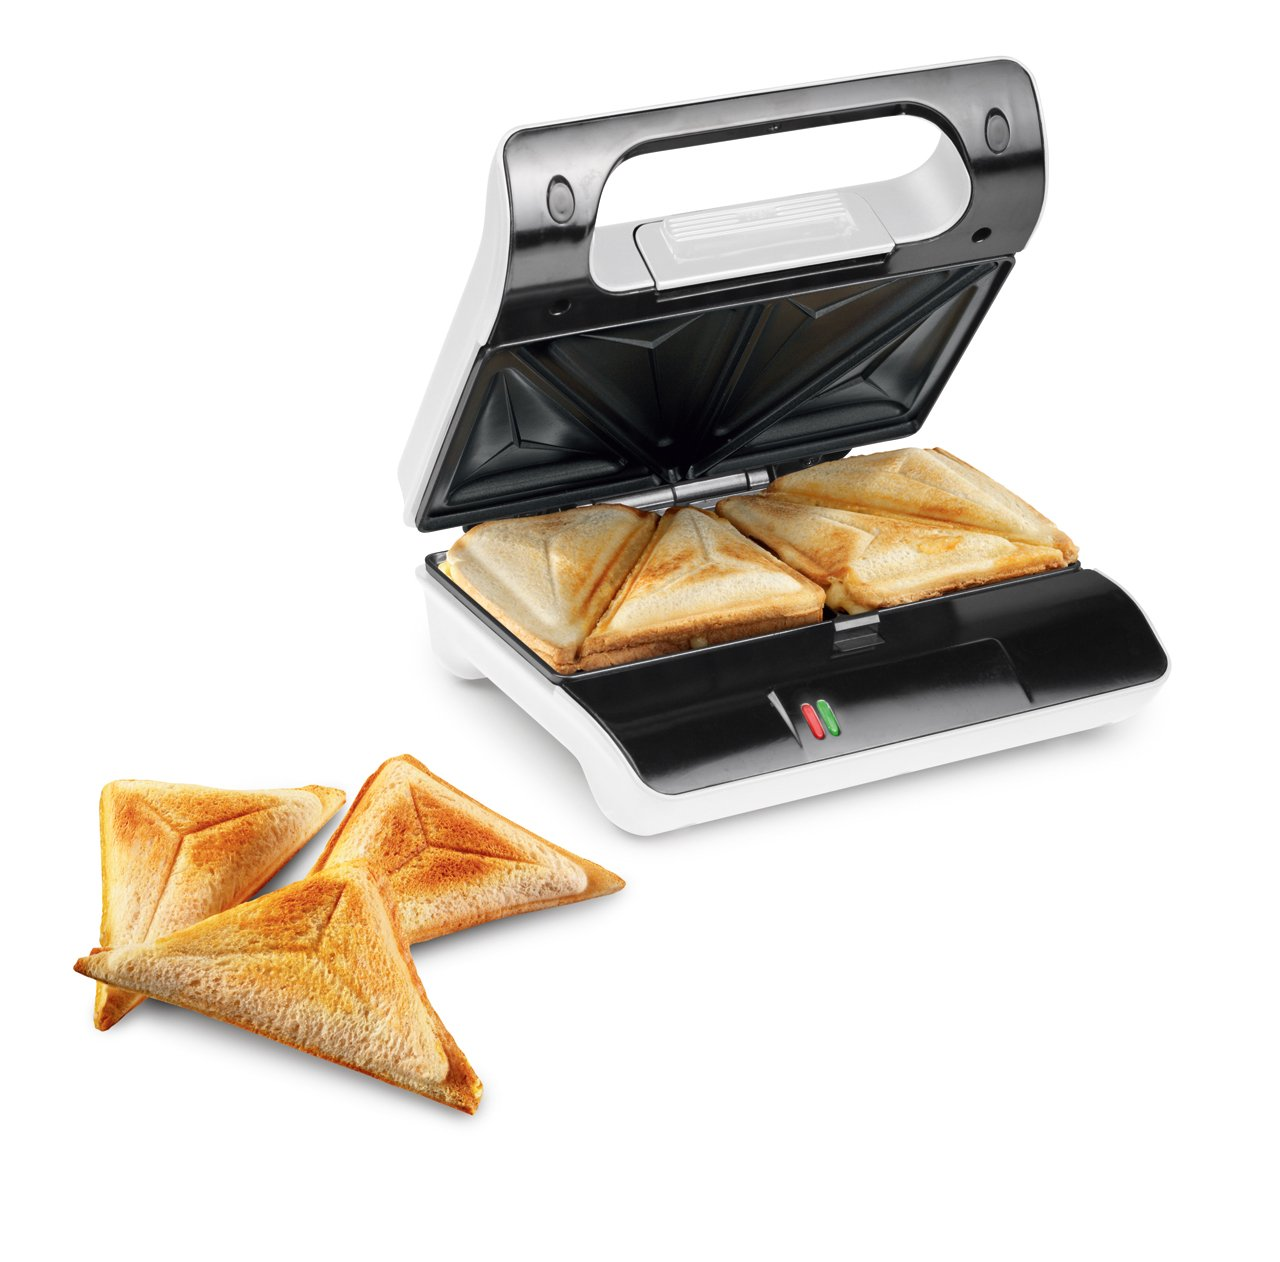 Sandwichera Princess Sandwich Grill Compact de 700W